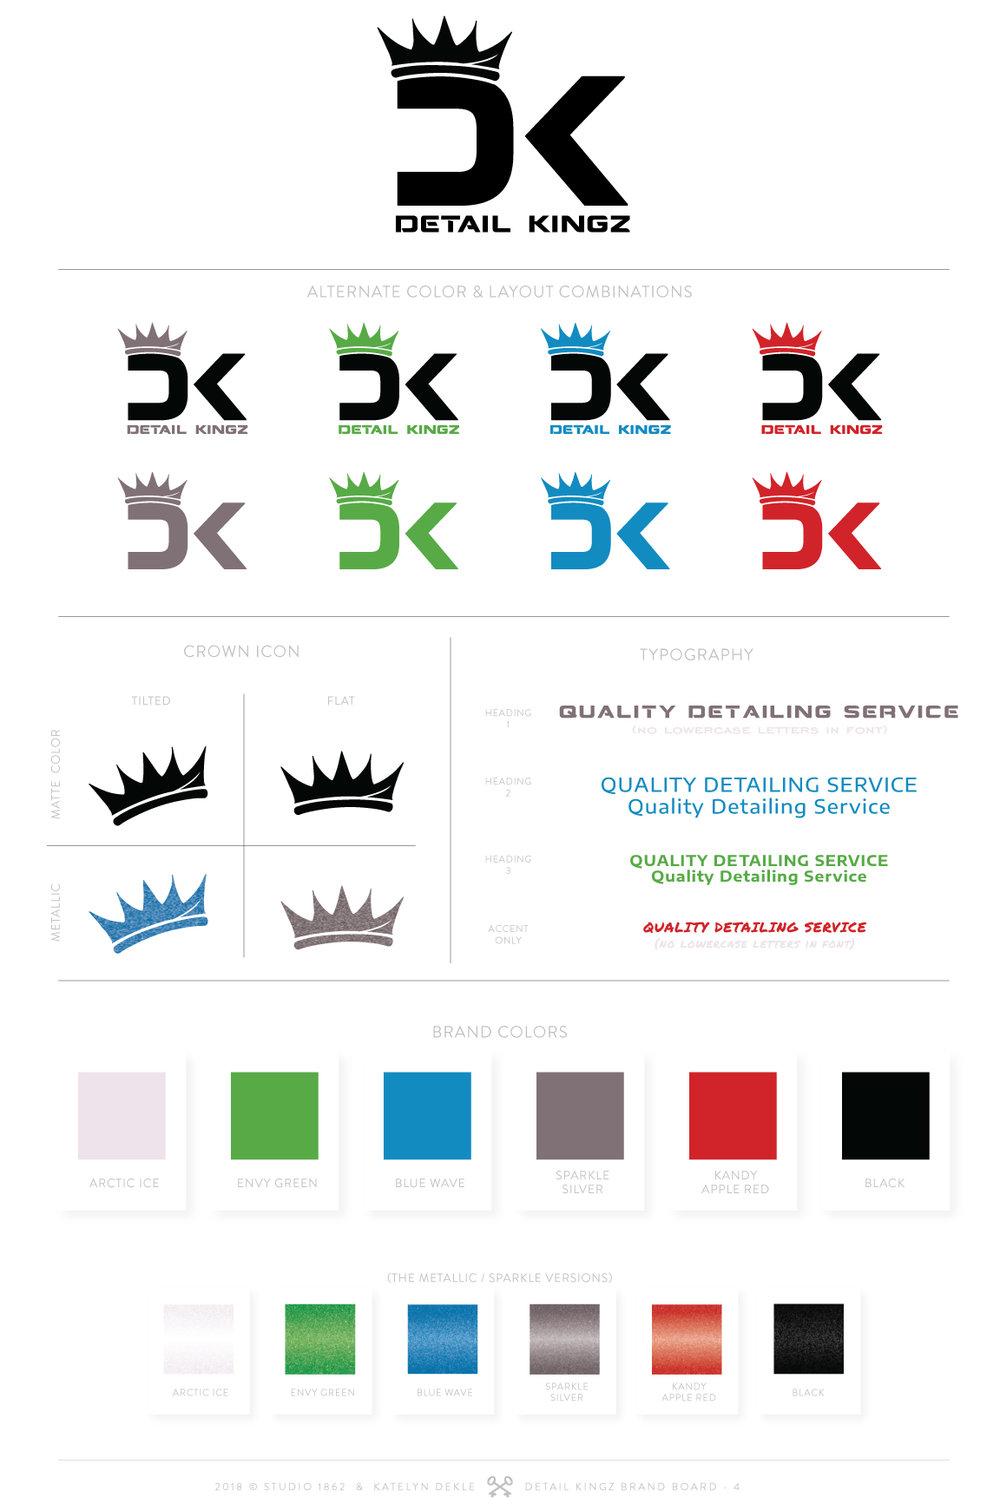 Detail-Kingz-proof4.jpg